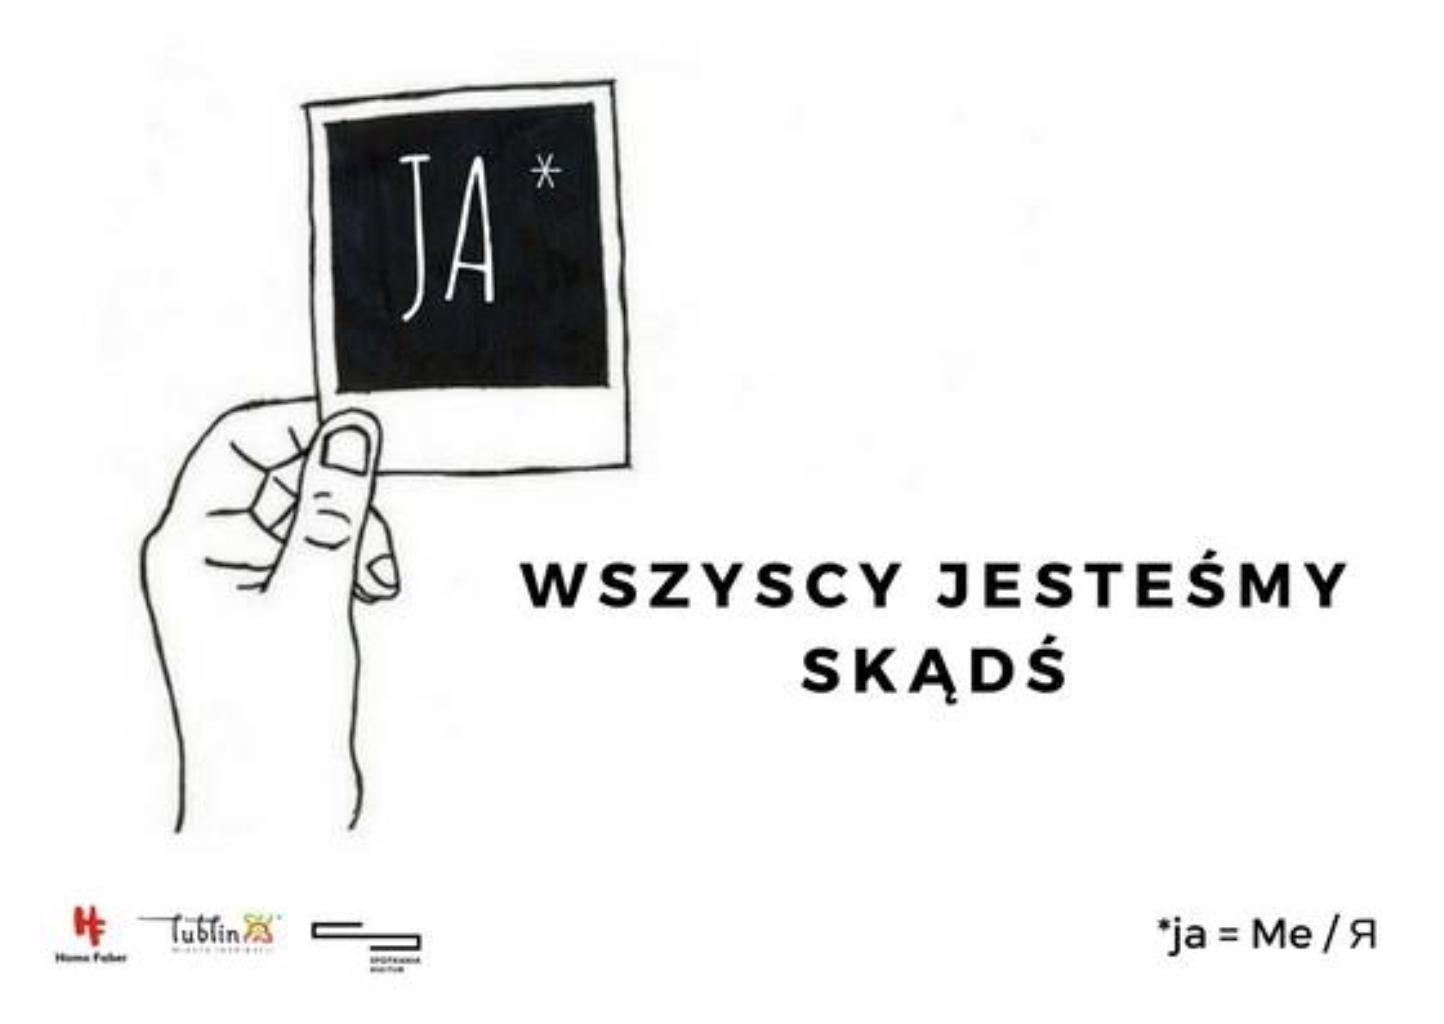 źródło: hf.org.pl